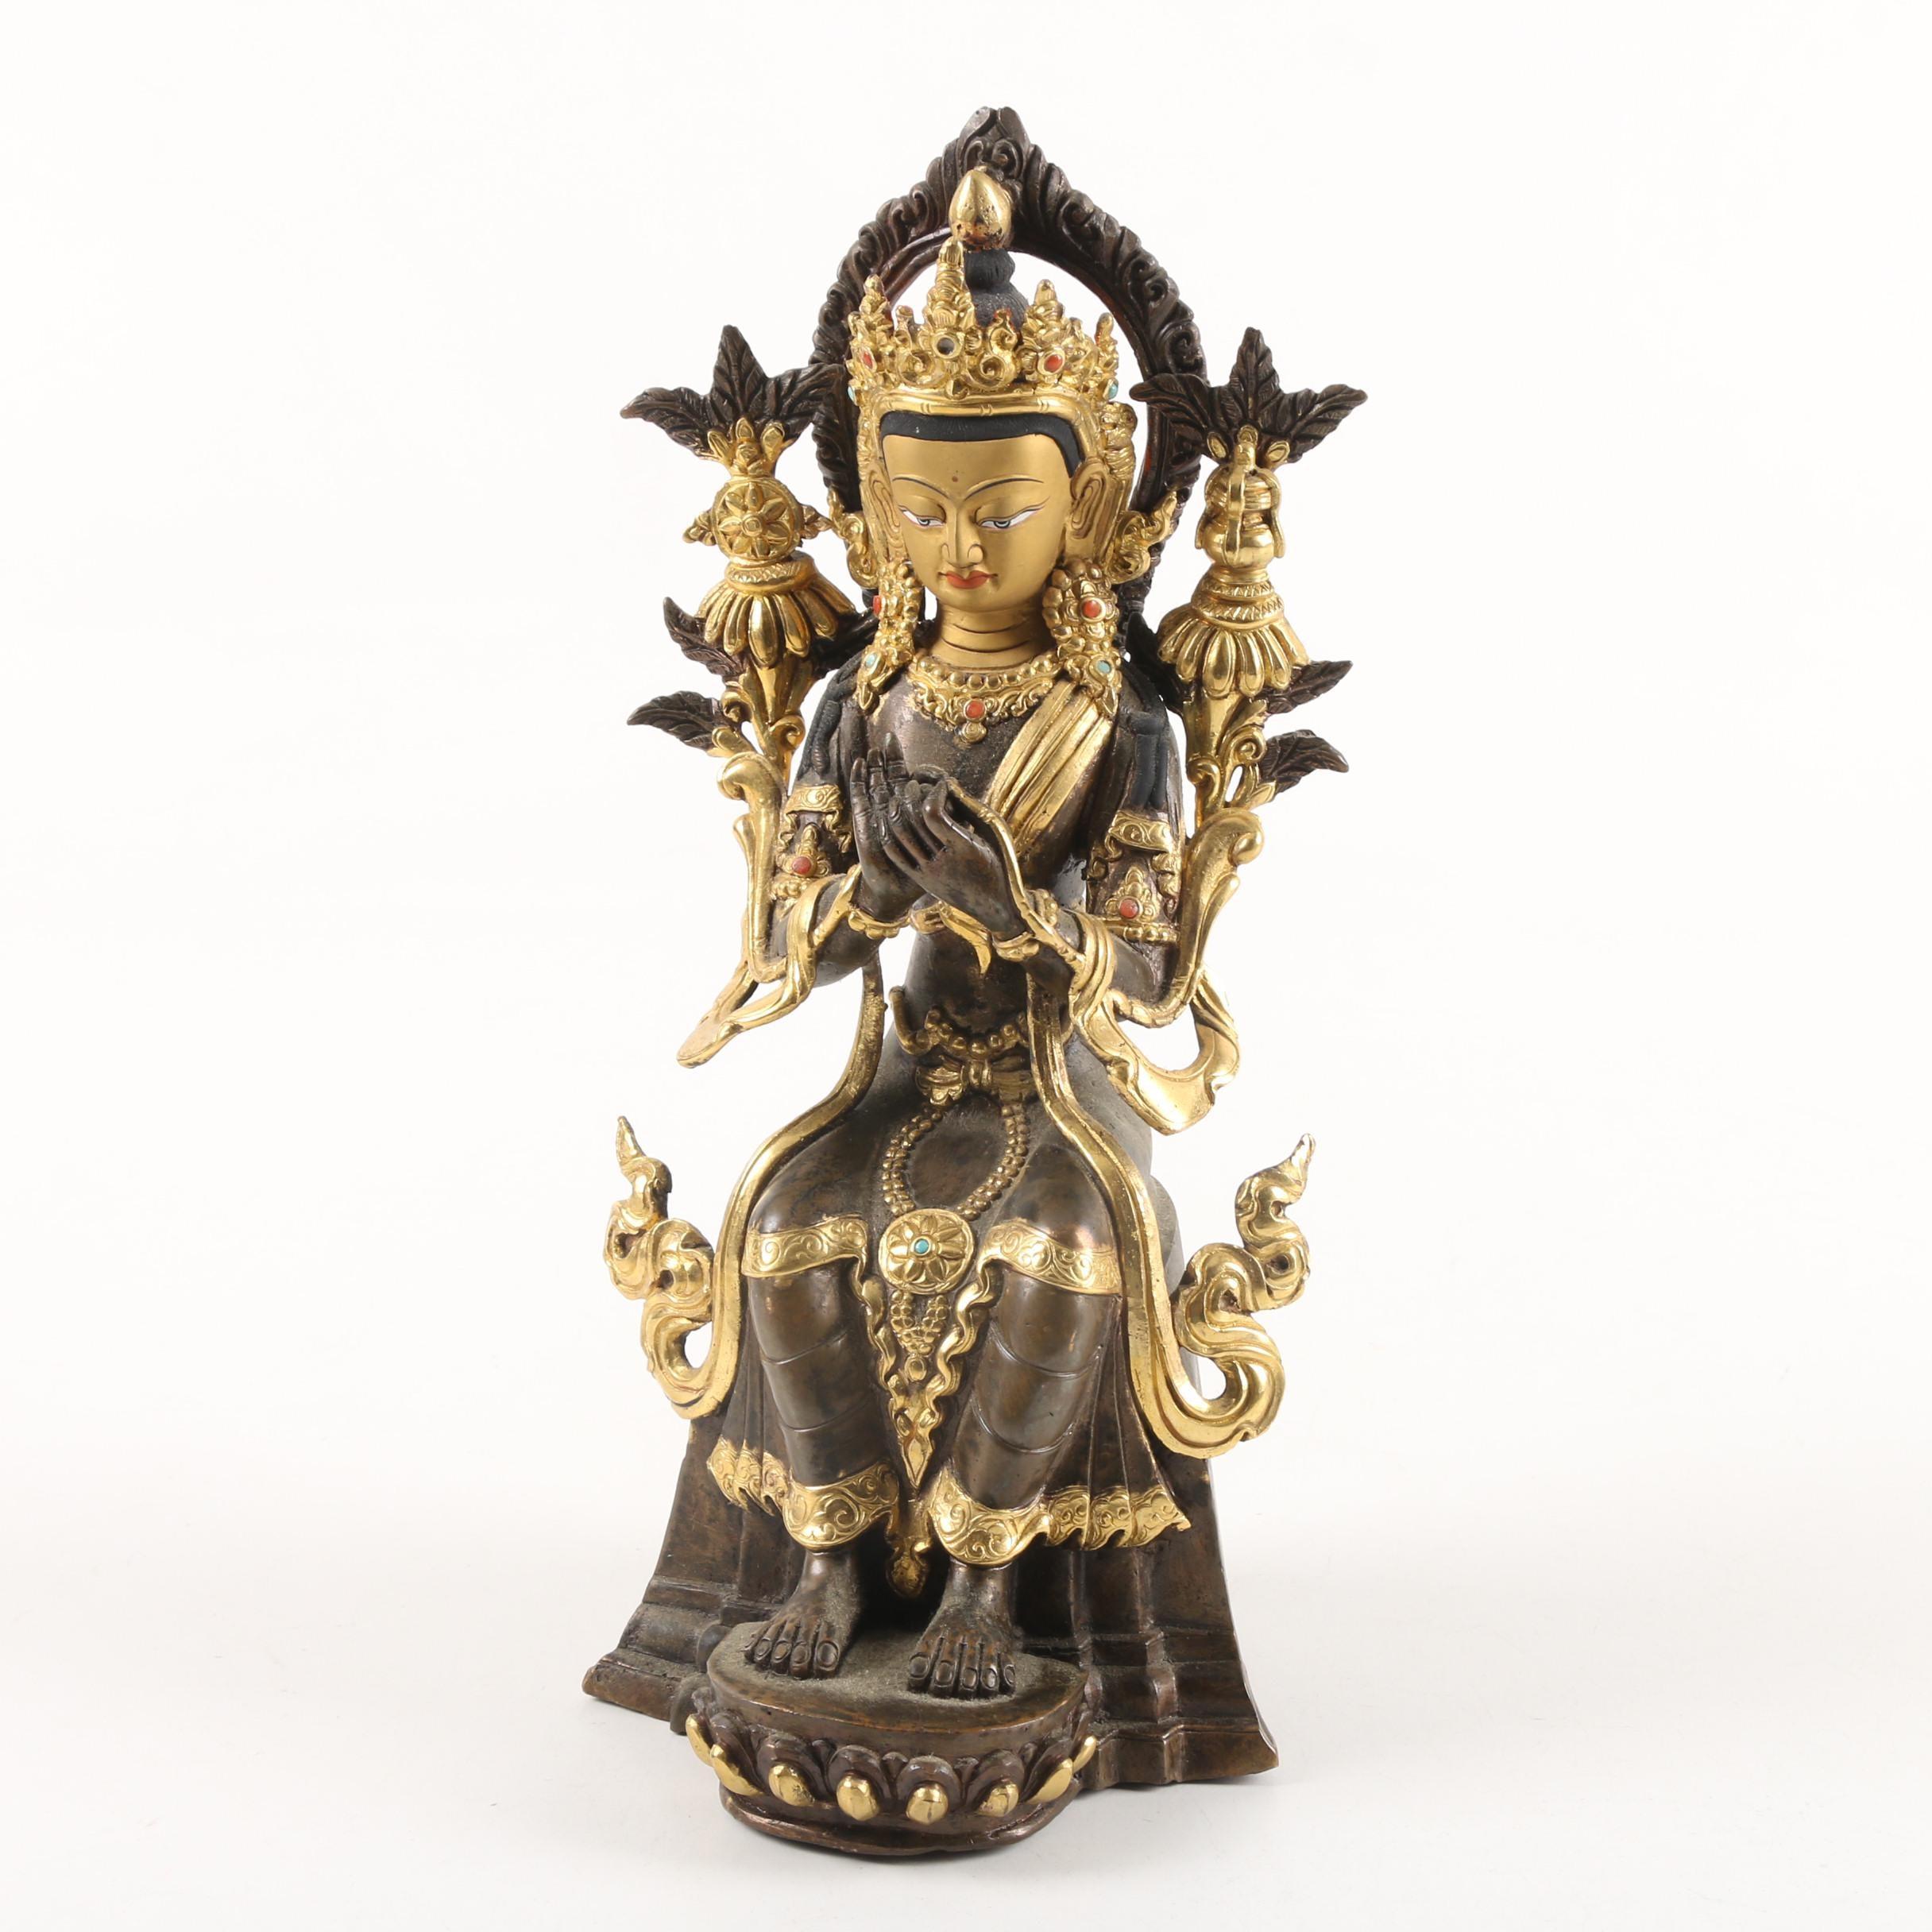 Tibetan Metal Sculpture of Tara Figure